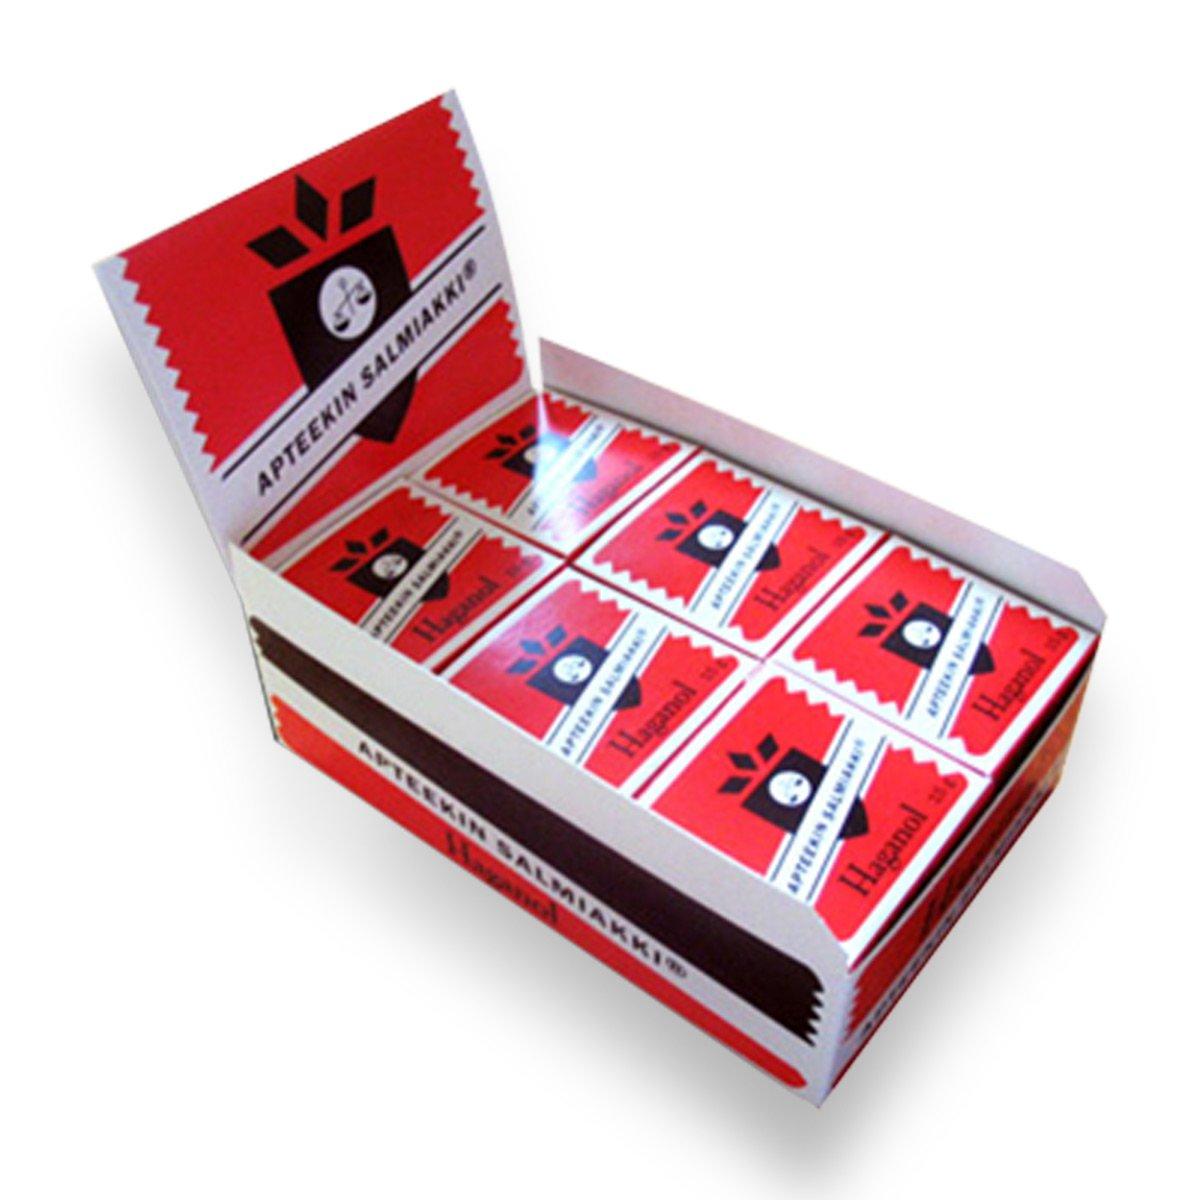 24 Boxes x 15g of Haganol Apteekin Salmiakki - Apothecary's Salmiak - Original - Finnish - Salty Licorice - Pastilles - Lozenges - Dragees - Drops - Candies - Sweets